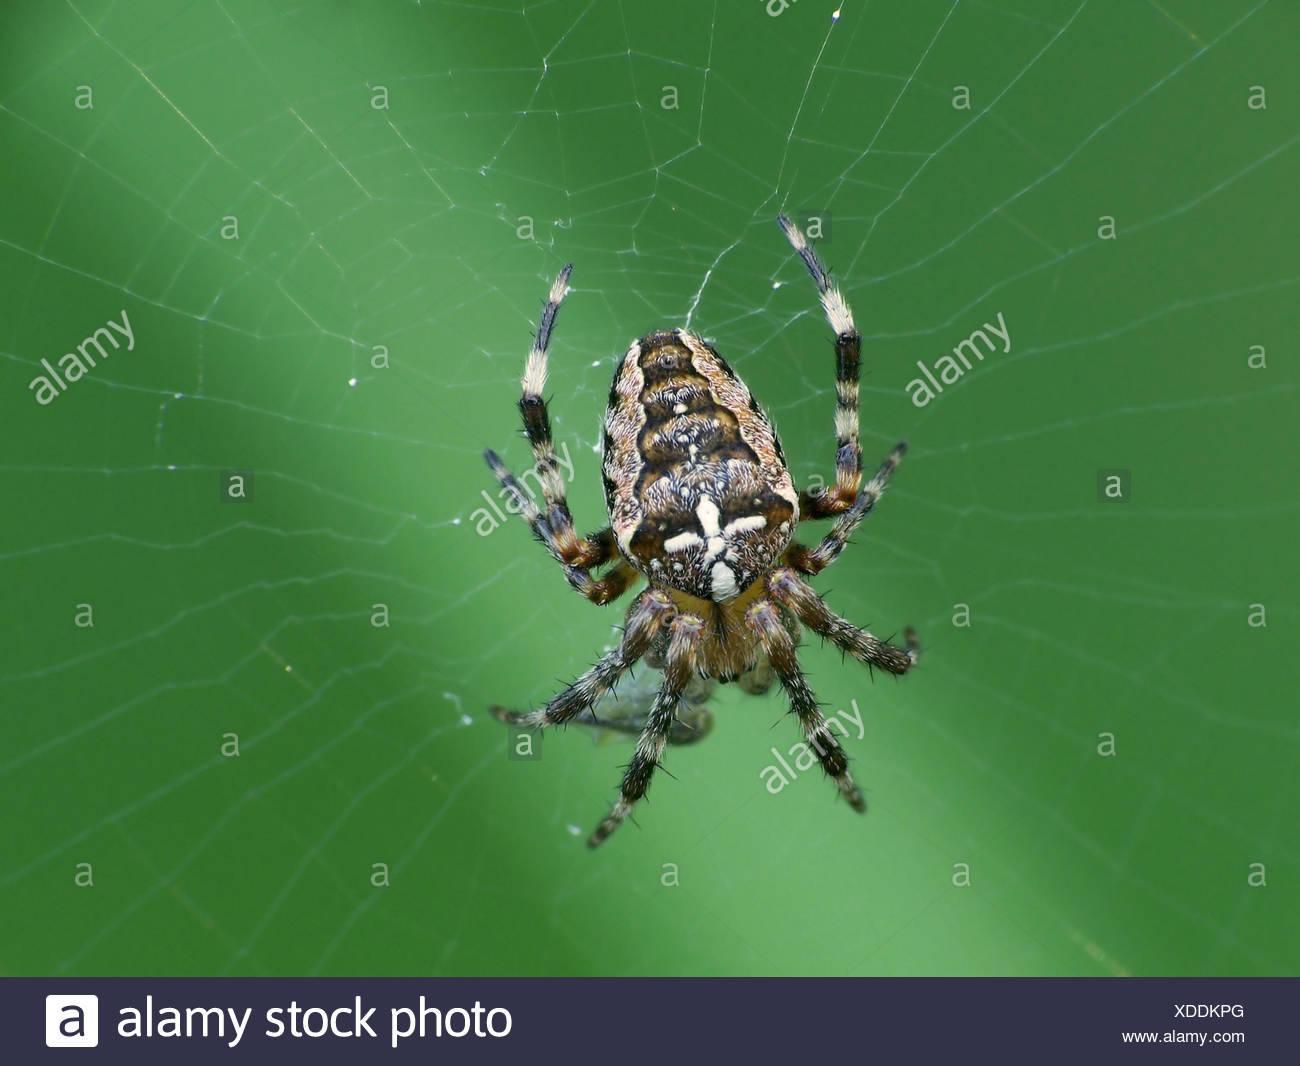 spider prey booty - Stock Image